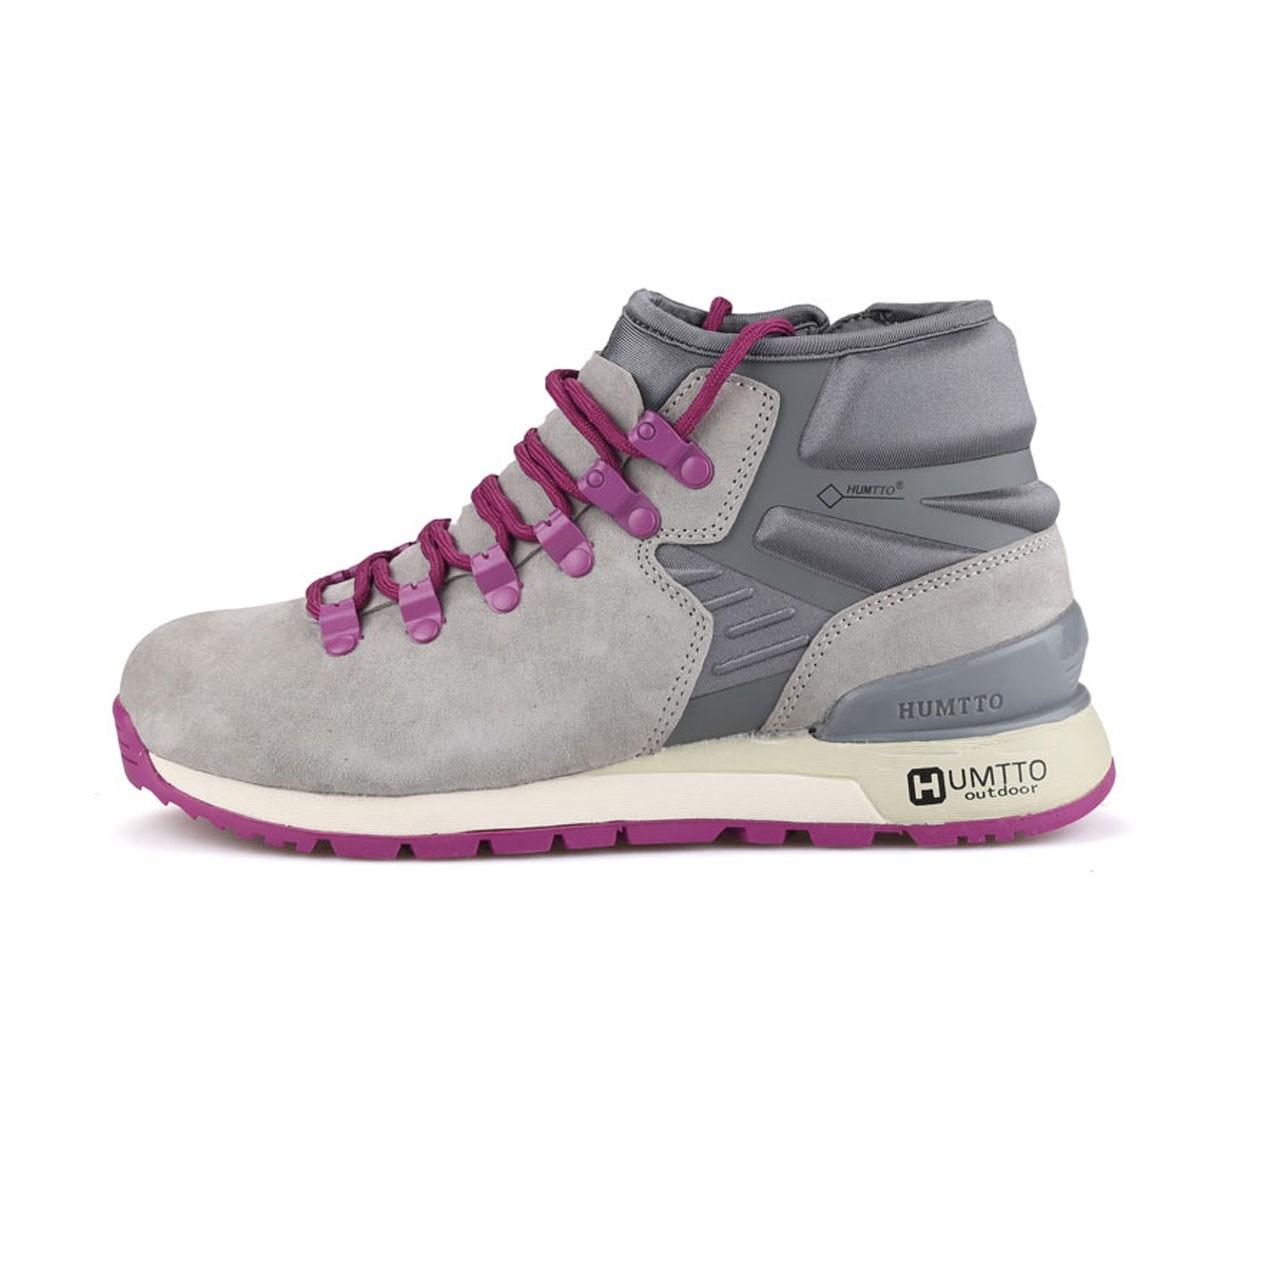 قیمت کفش کوهنوردی مردانه هامتو مدل 1-736622